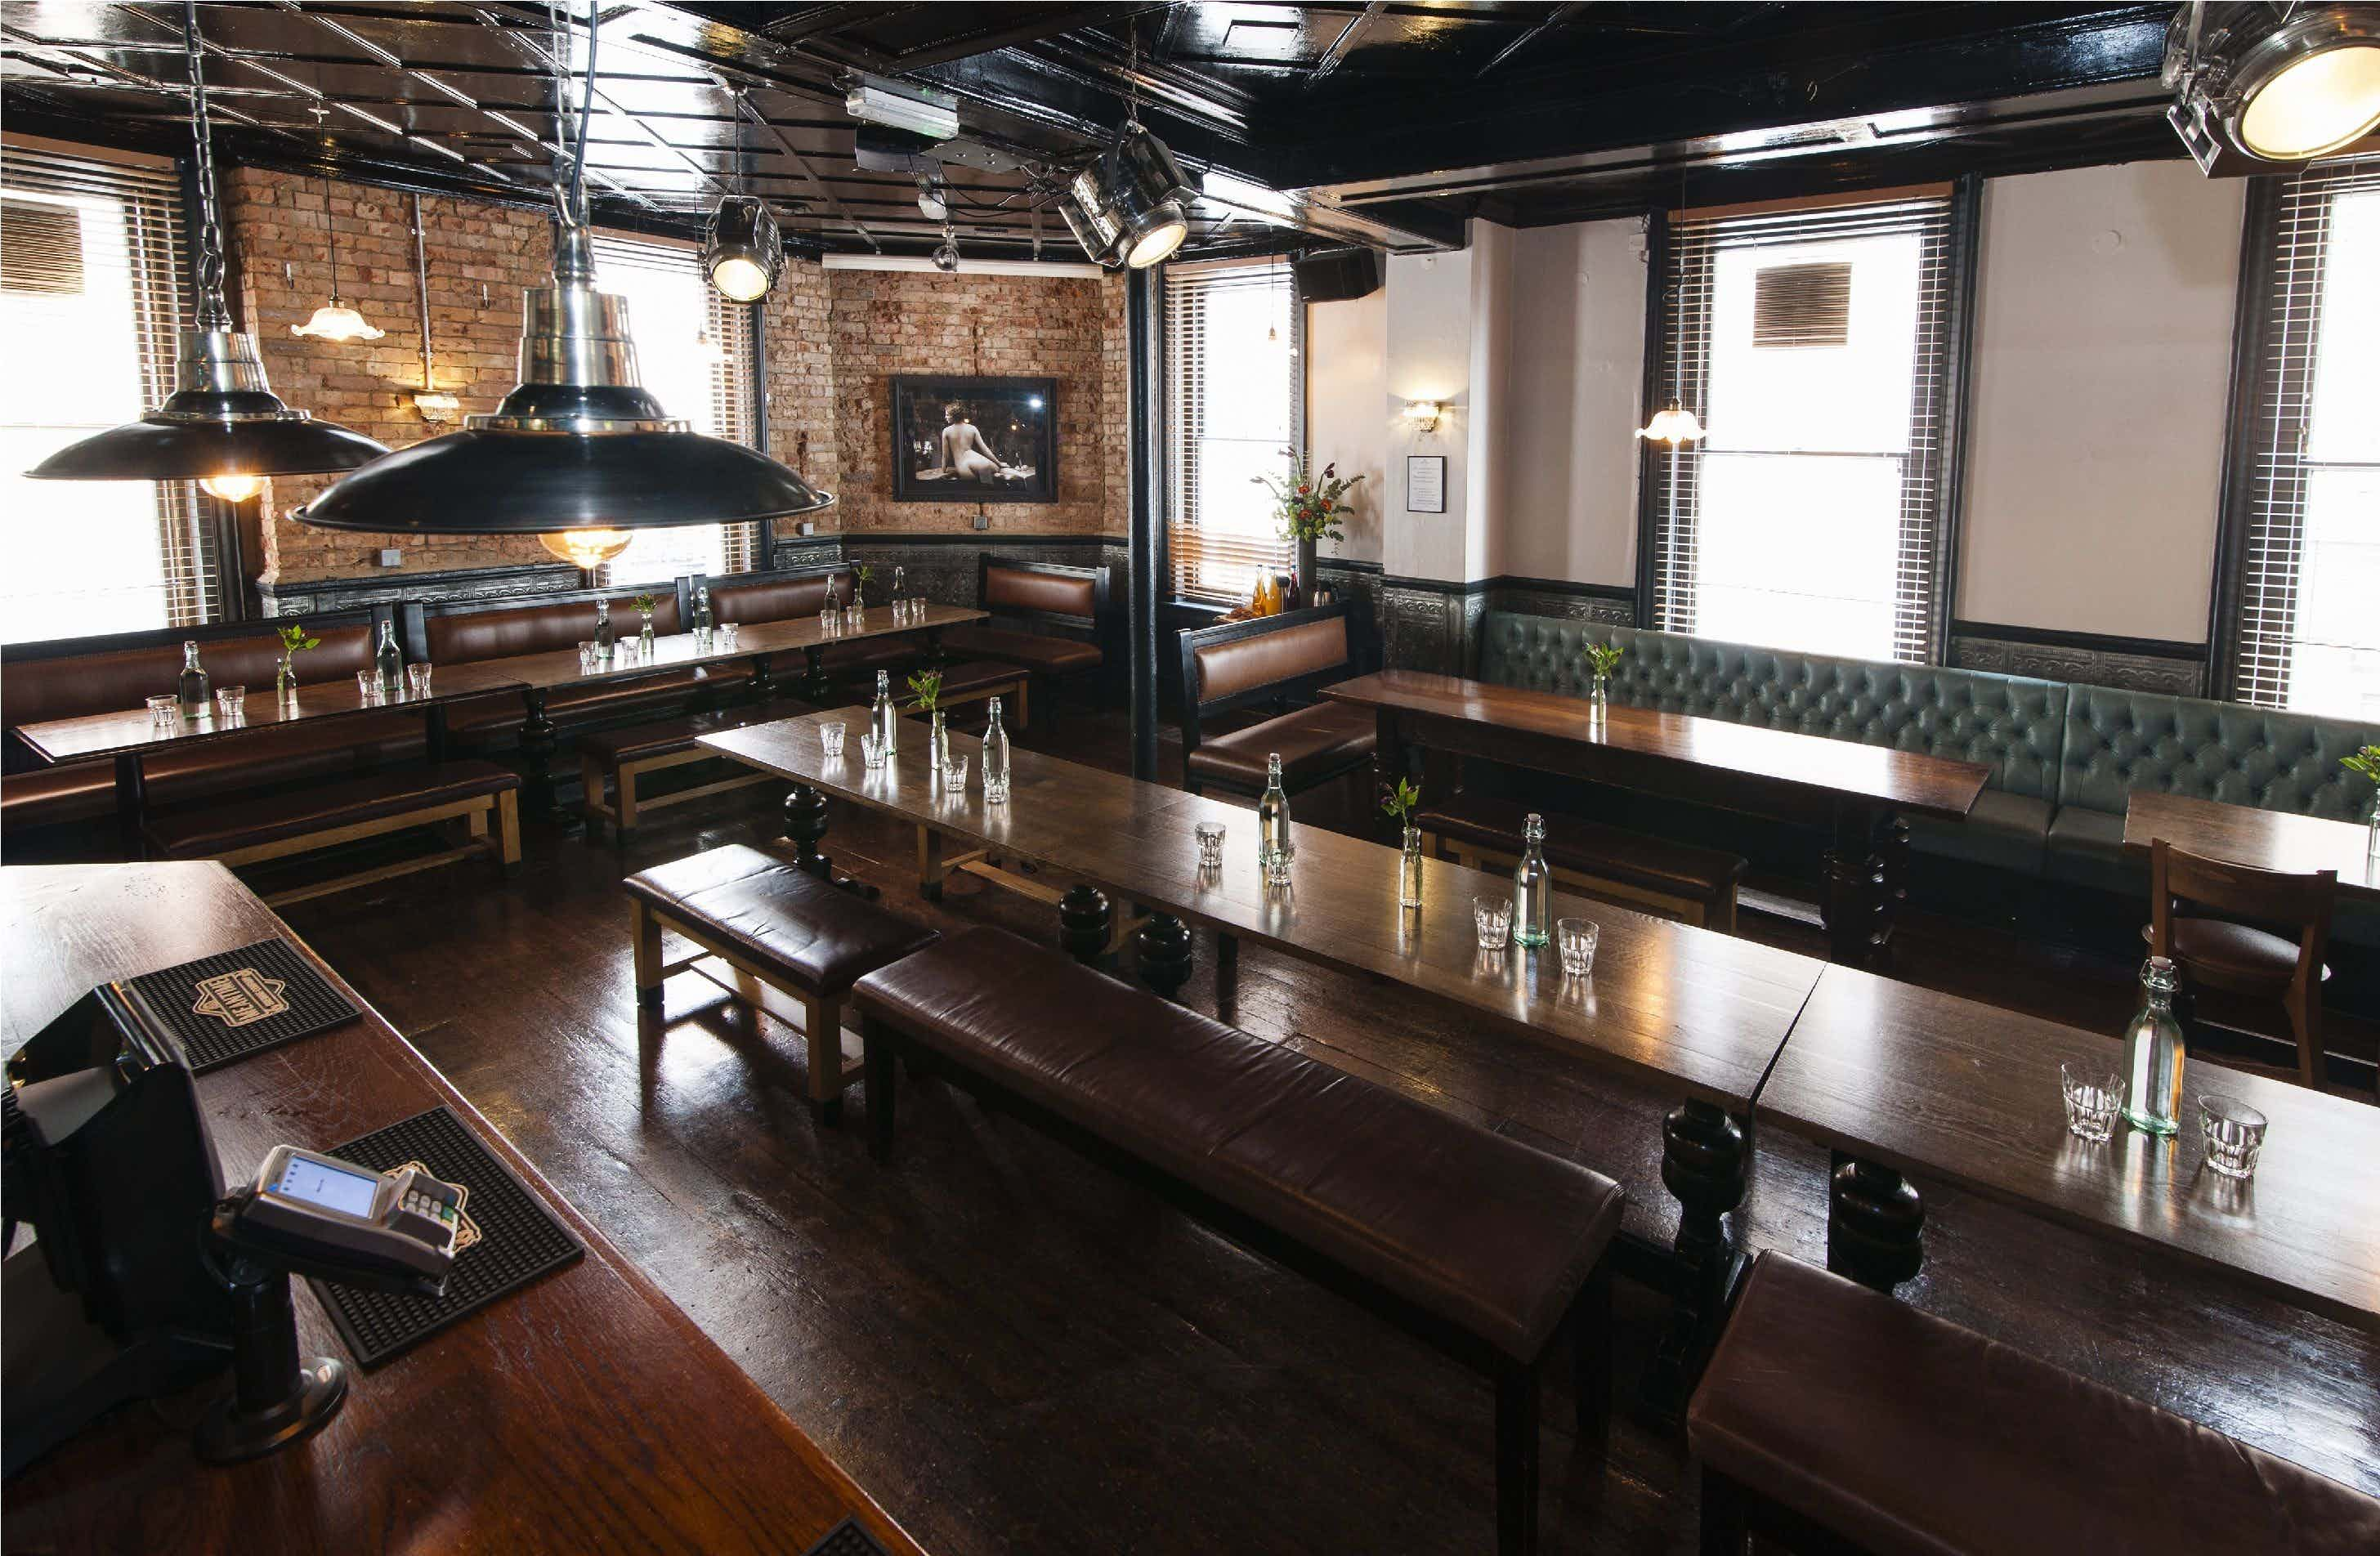 Chairmen's Lounge, Crown & Two Chairmen